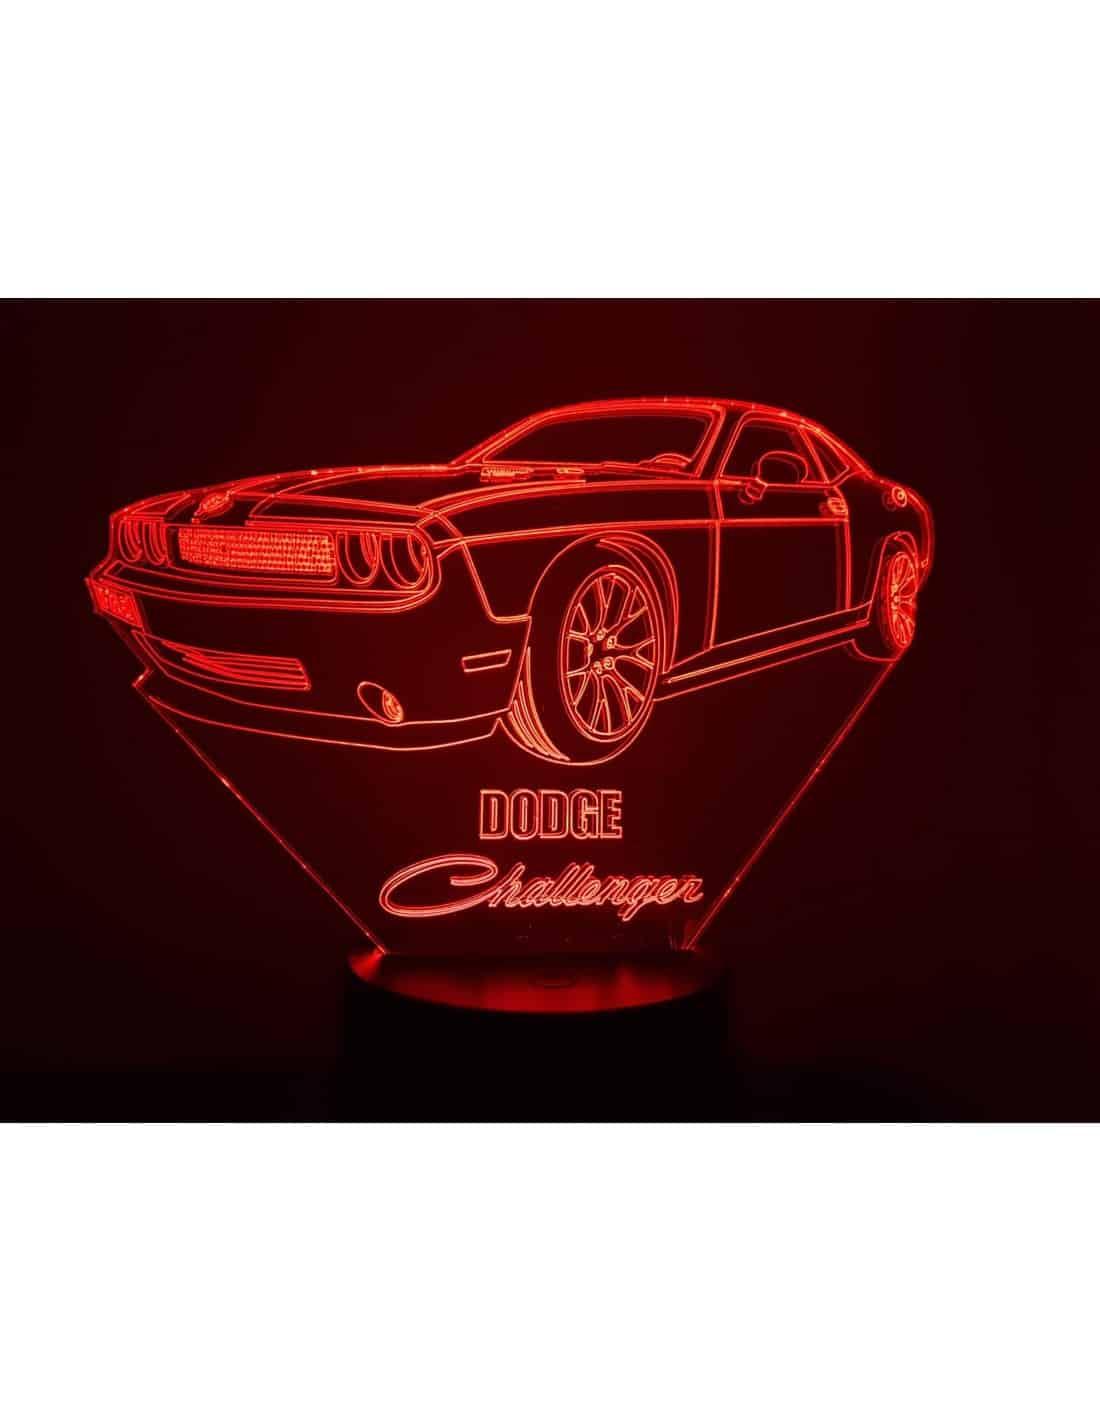 Dodge Challenger 3D Illusion Led Lamp